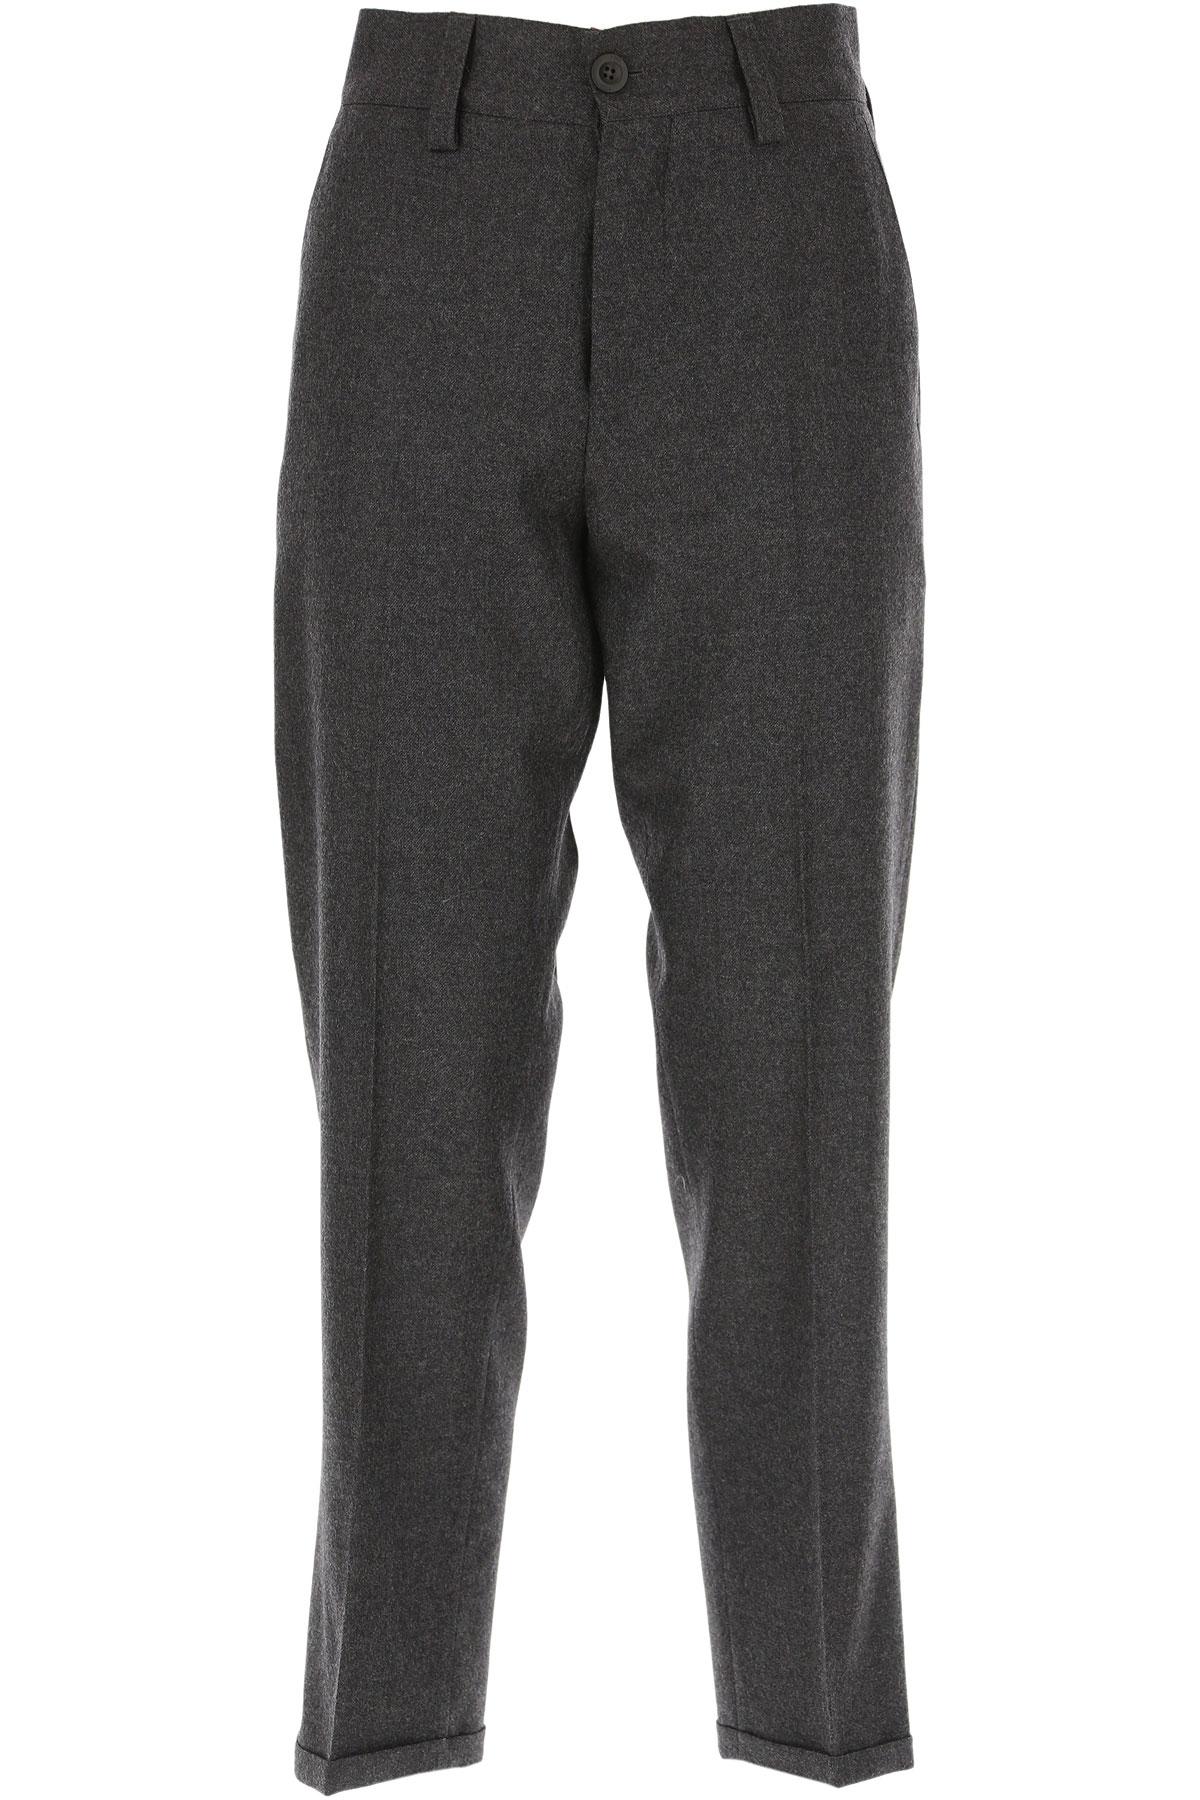 PT01 Pants for Women On Sale, Grey, Virgin wool, 2019, 26 28 32